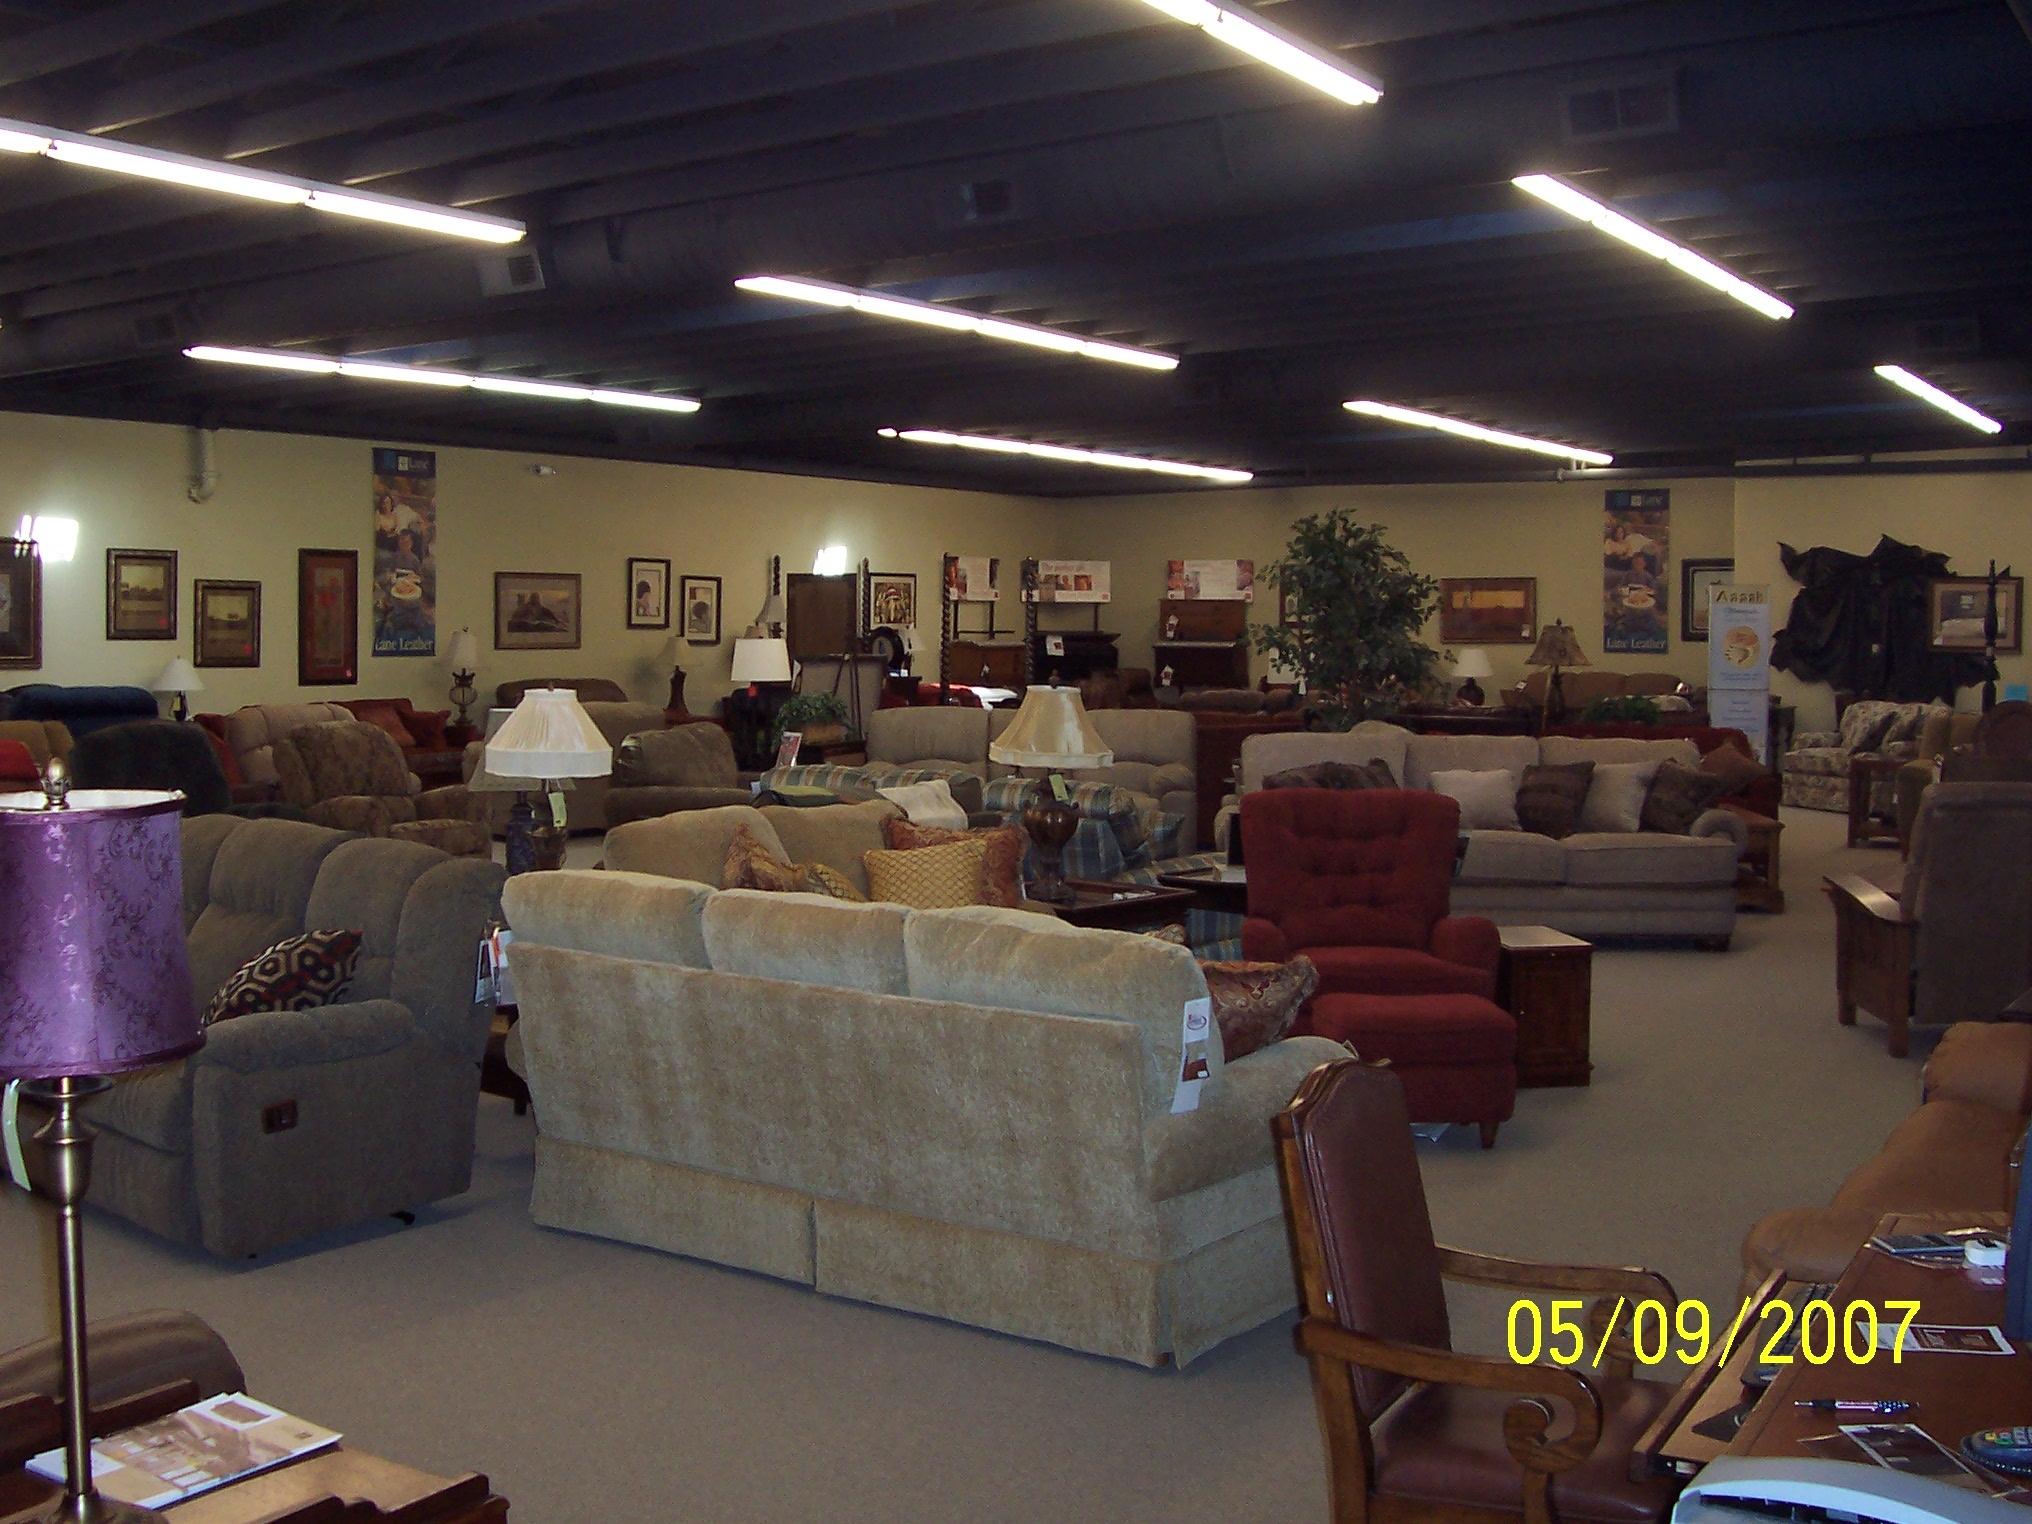 wholesale furniture brokers home design ideas. Black Bedroom Furniture Sets. Home Design Ideas